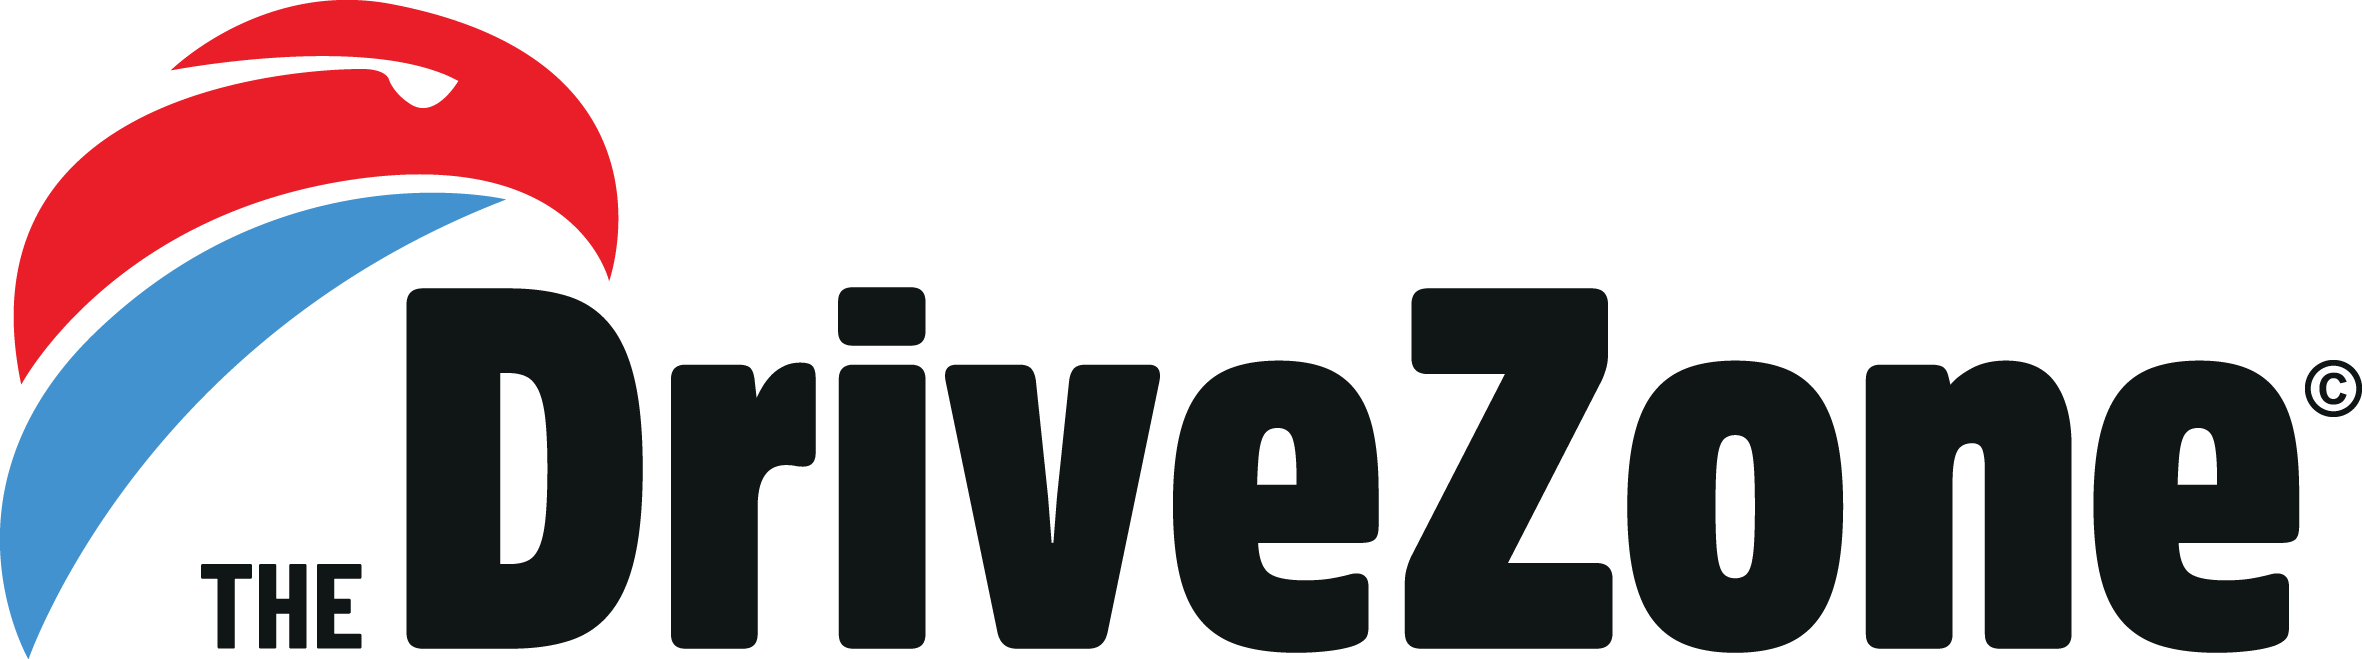 608 drive zone logo symbol text color black rgb